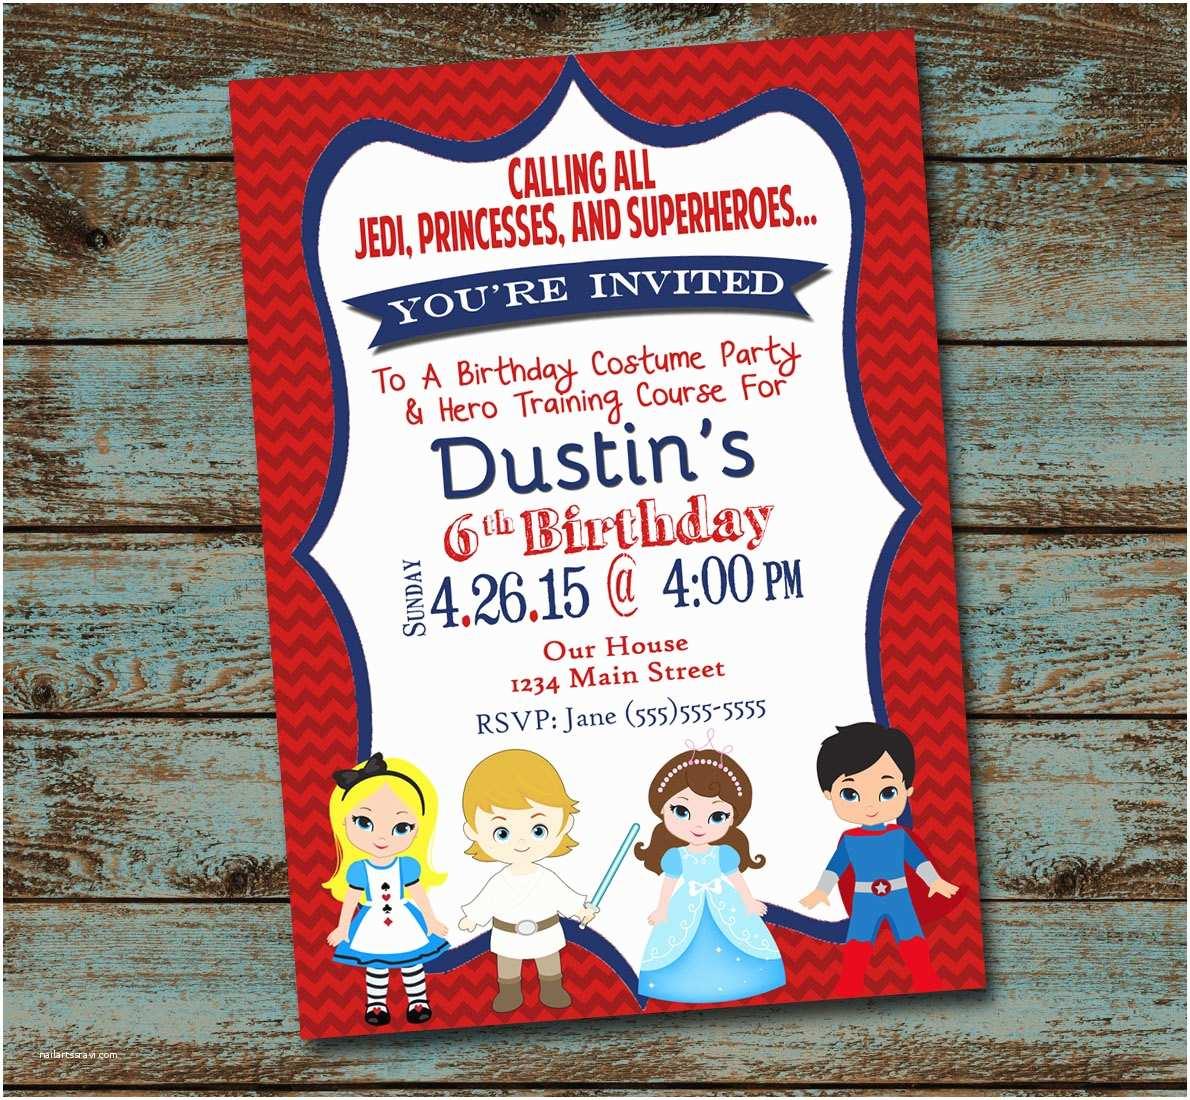 Costume Birthday Party Invitations Costume Party Invitation Costume Birthday by